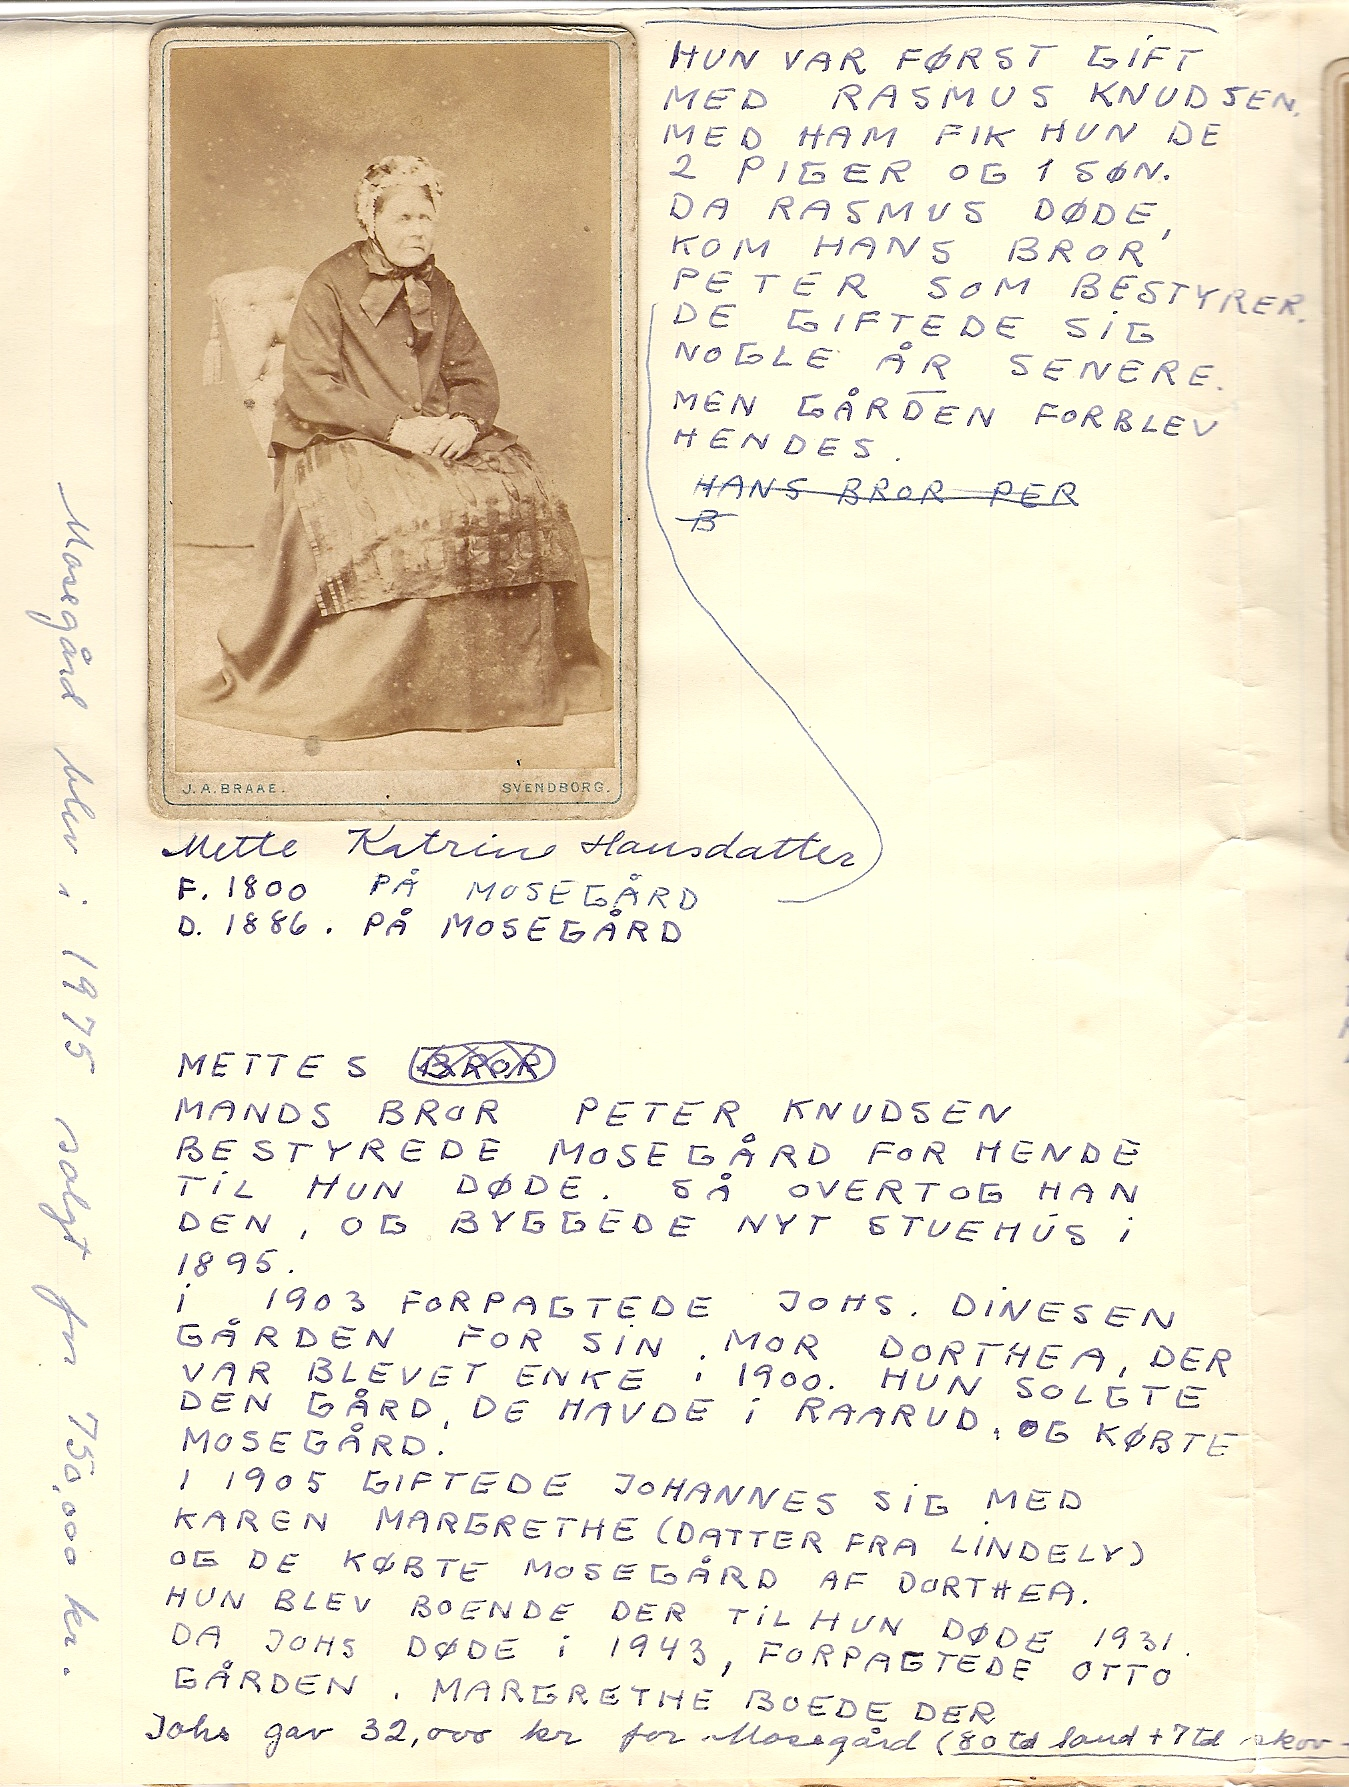 Mette Katrine Hansdatter (1800-86)